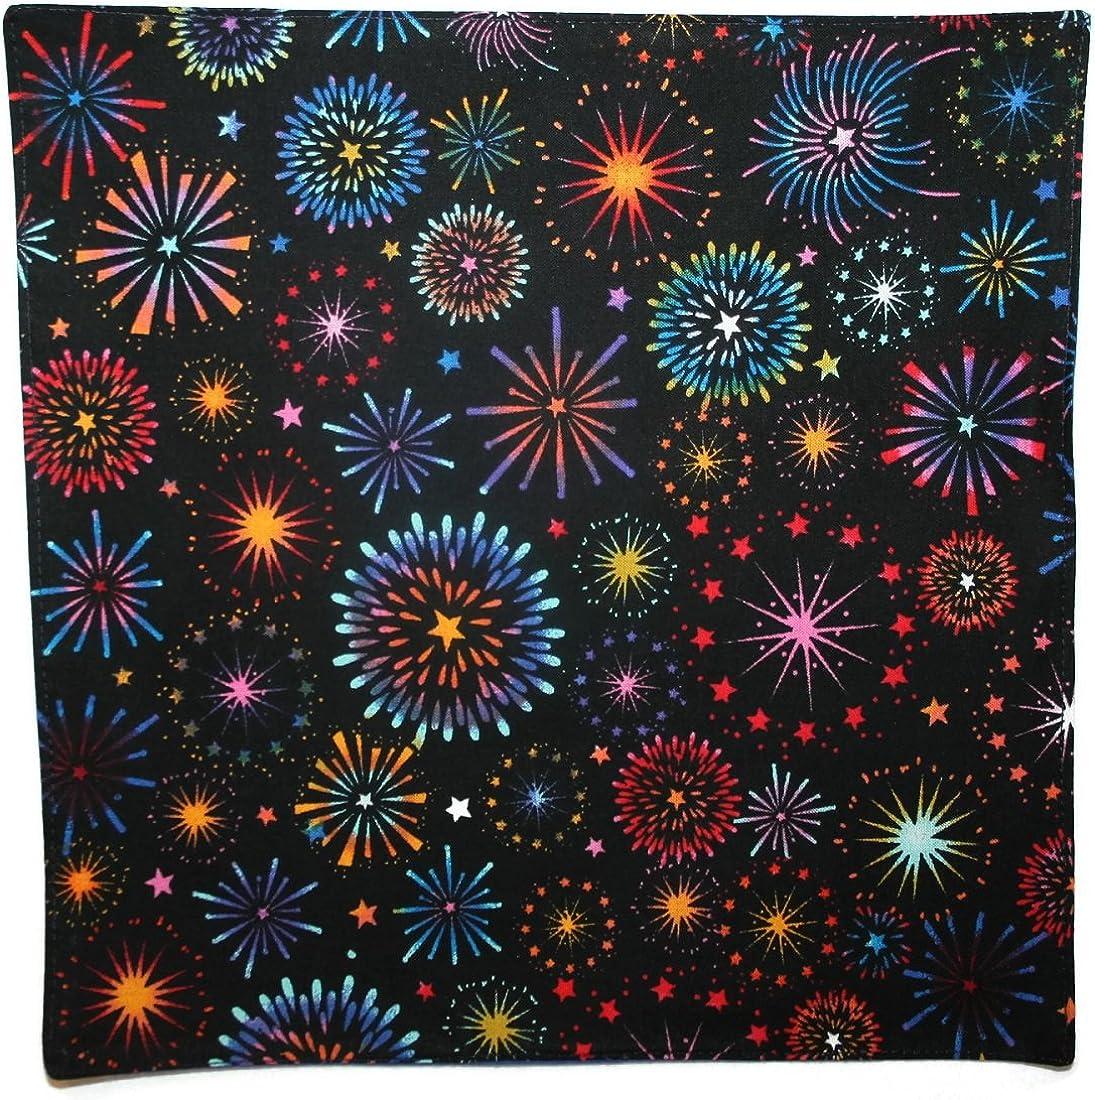 B01MZ8MTAE Holiday Bow Ties Mens Handkerchief Black Multi Colored Firework Pocket Square 712BmEUjCDIL